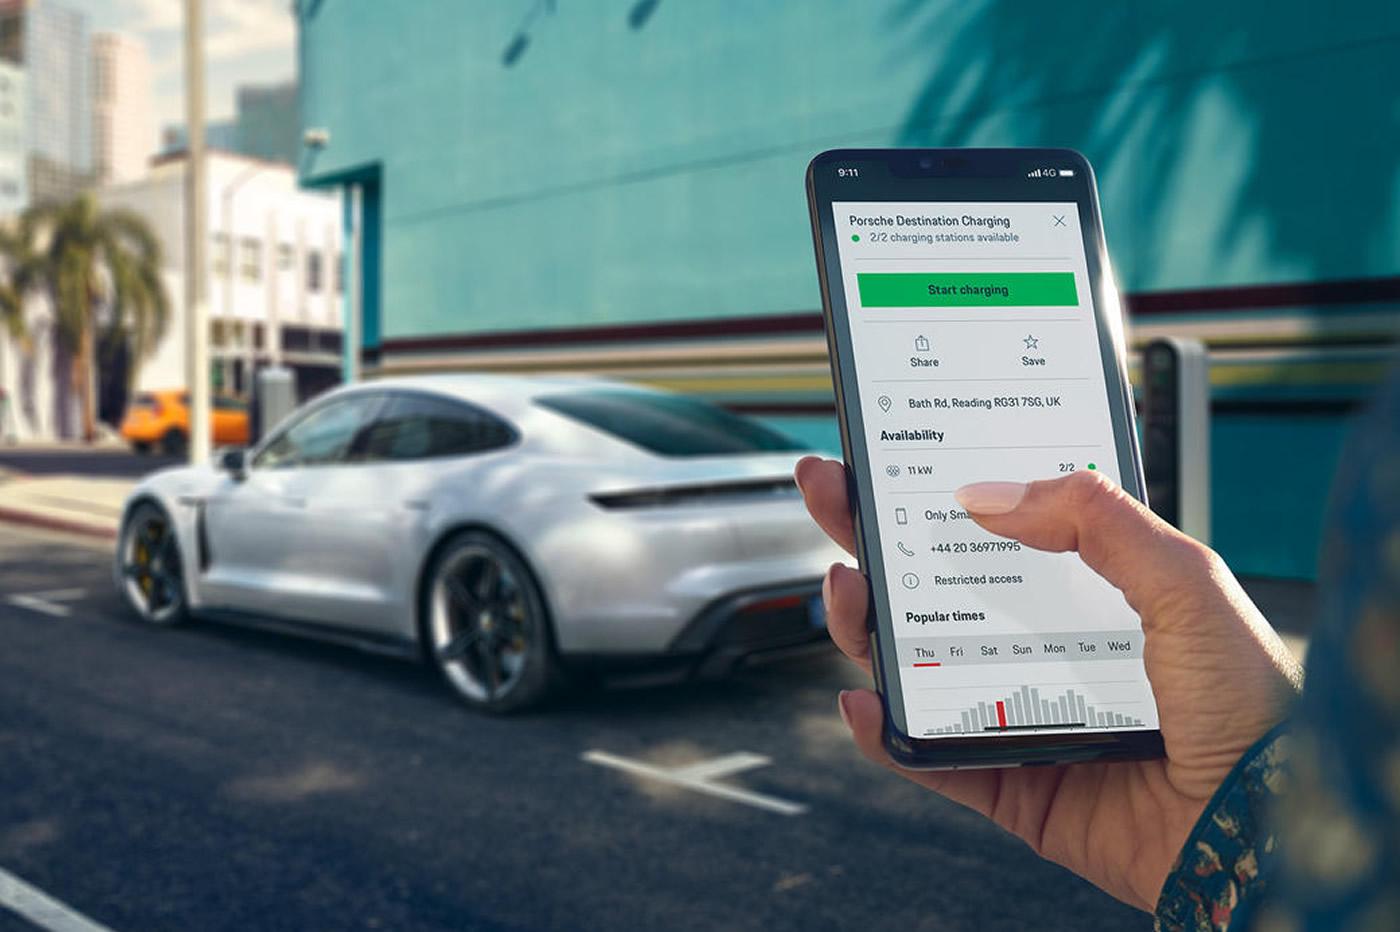 Porsche recharge a destination